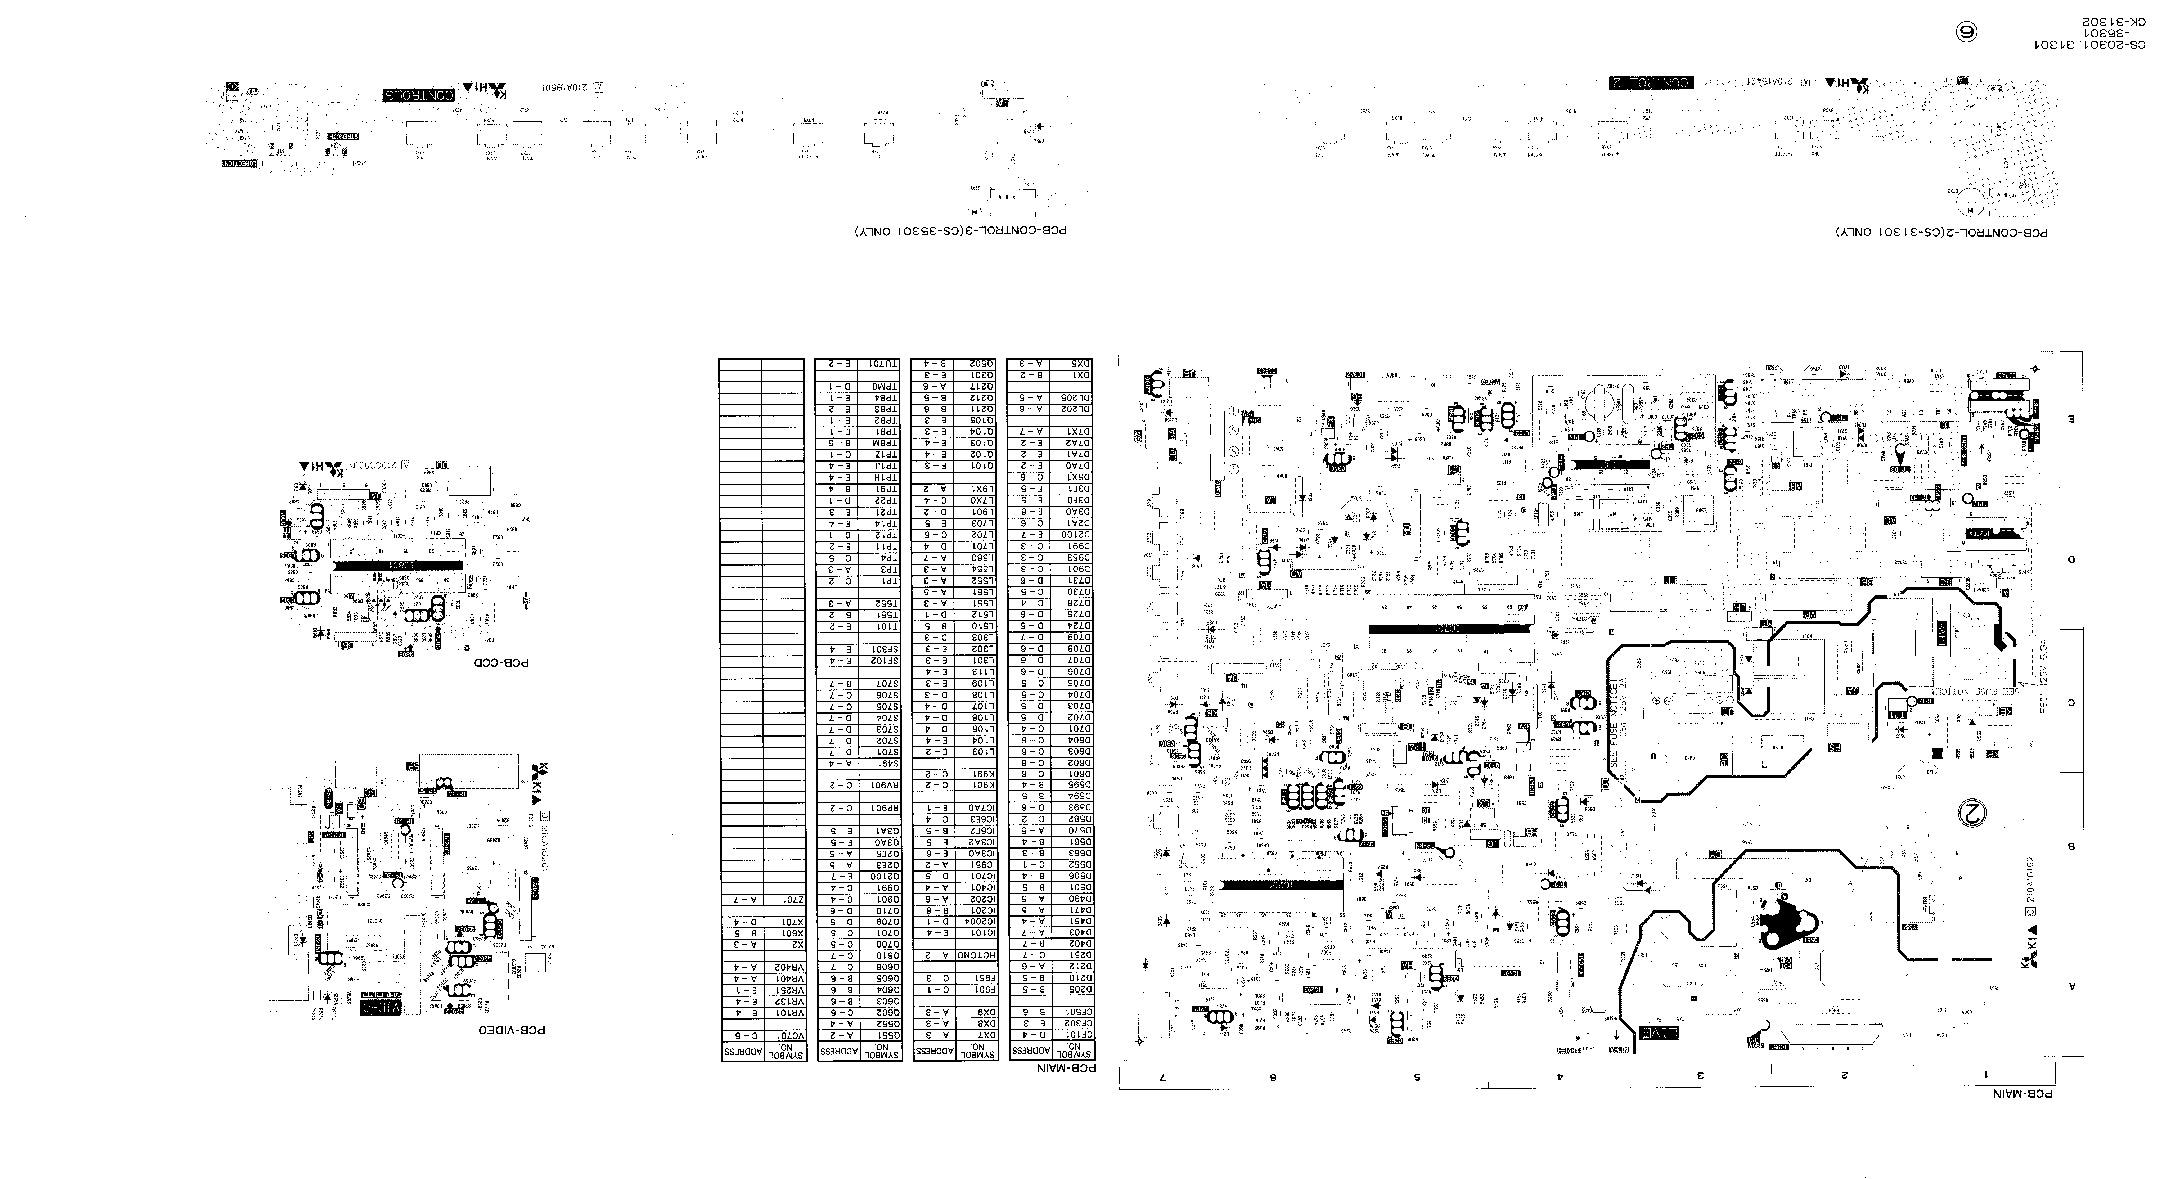 MITSUBISHI mitsubishi CK 31302 mitsubishi CK 31302 pdf